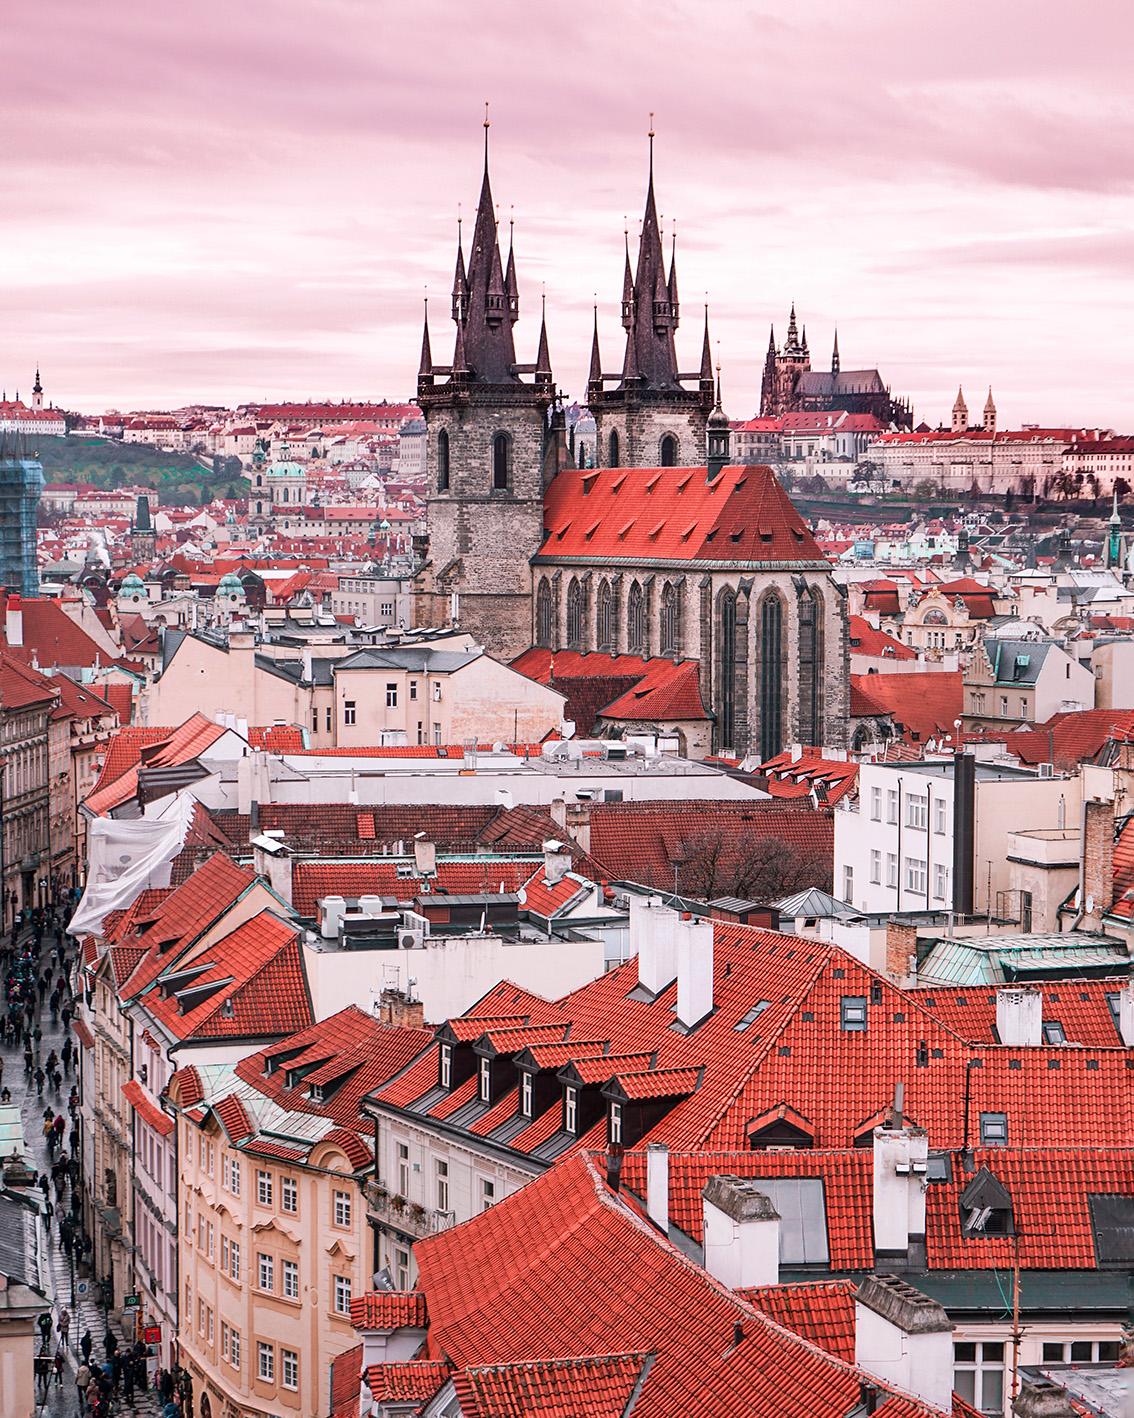 31 Weekend a Praga: 7 cose da vedere, dove dormire, gli indirizzi food e i Mercatini di Natale più belli.